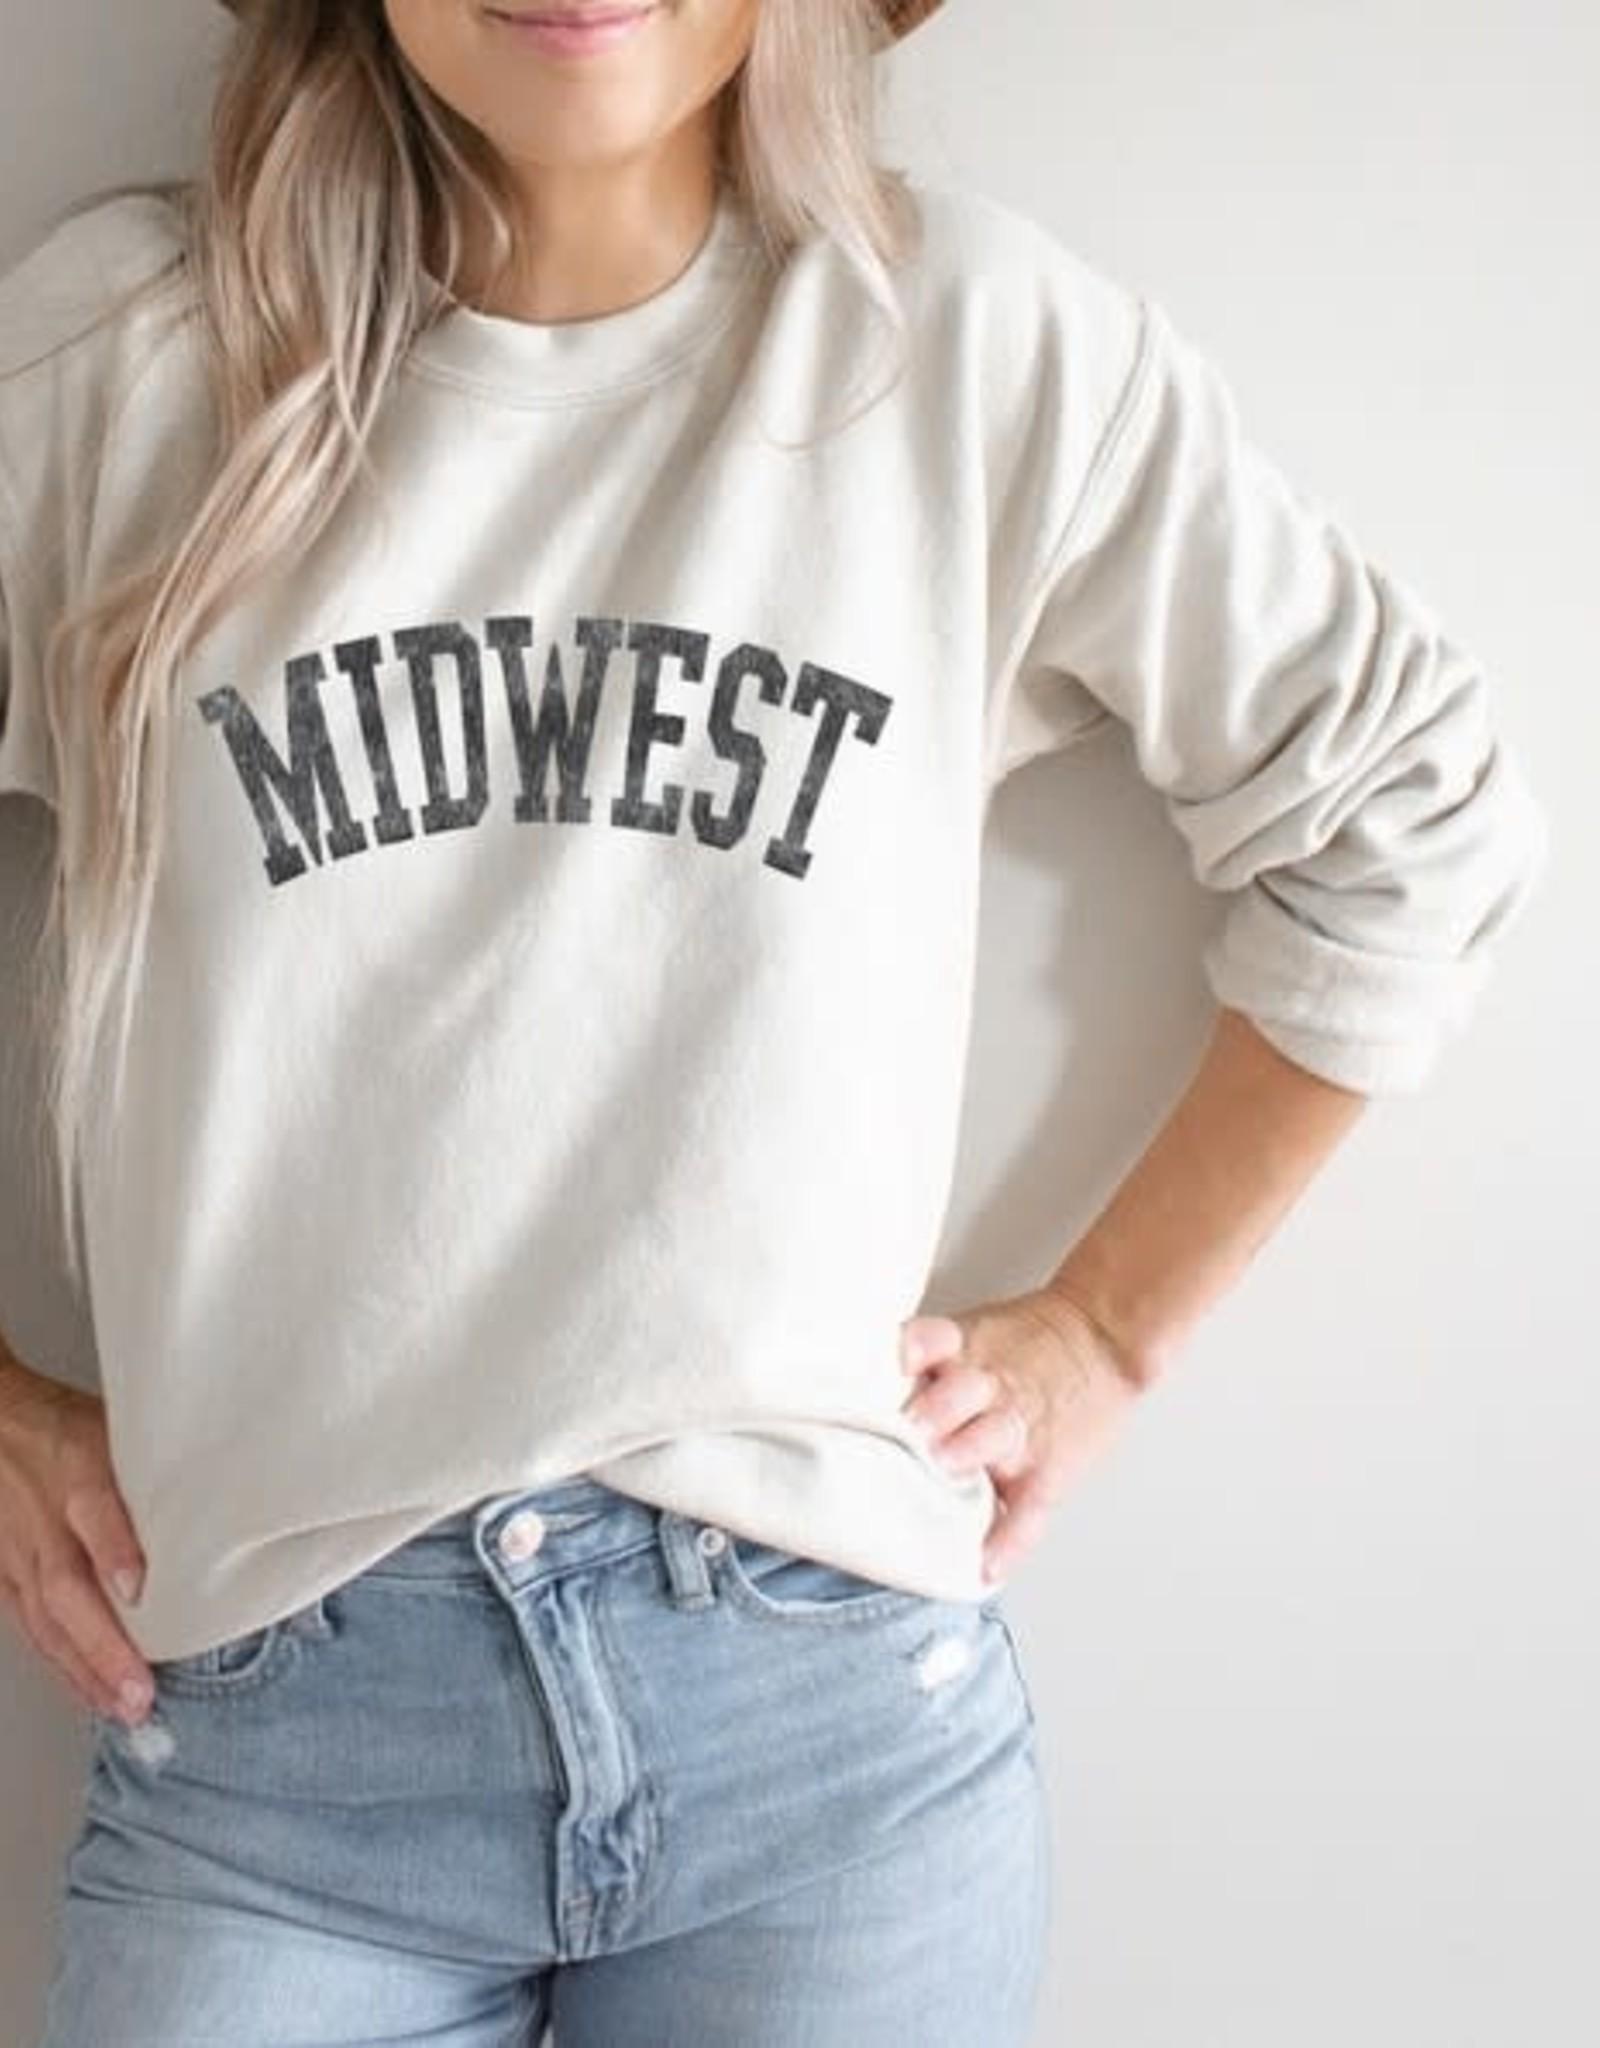 - Beige MIDWEST Crewneck Sweatshirt